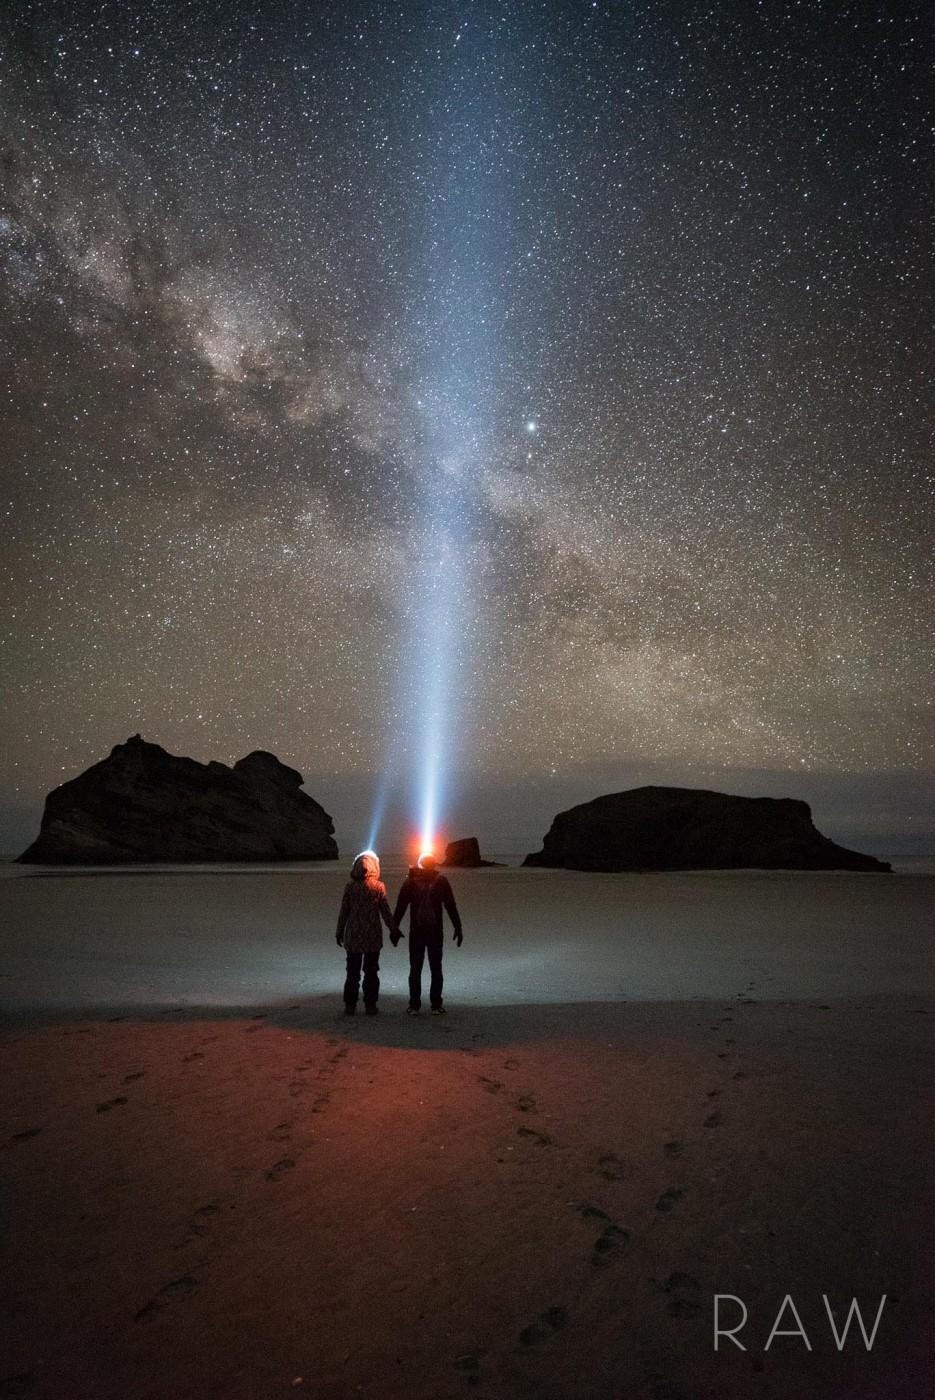 waterton-milky-way-astrophotography-lonely-speck-lightroom-preset-2-fixed